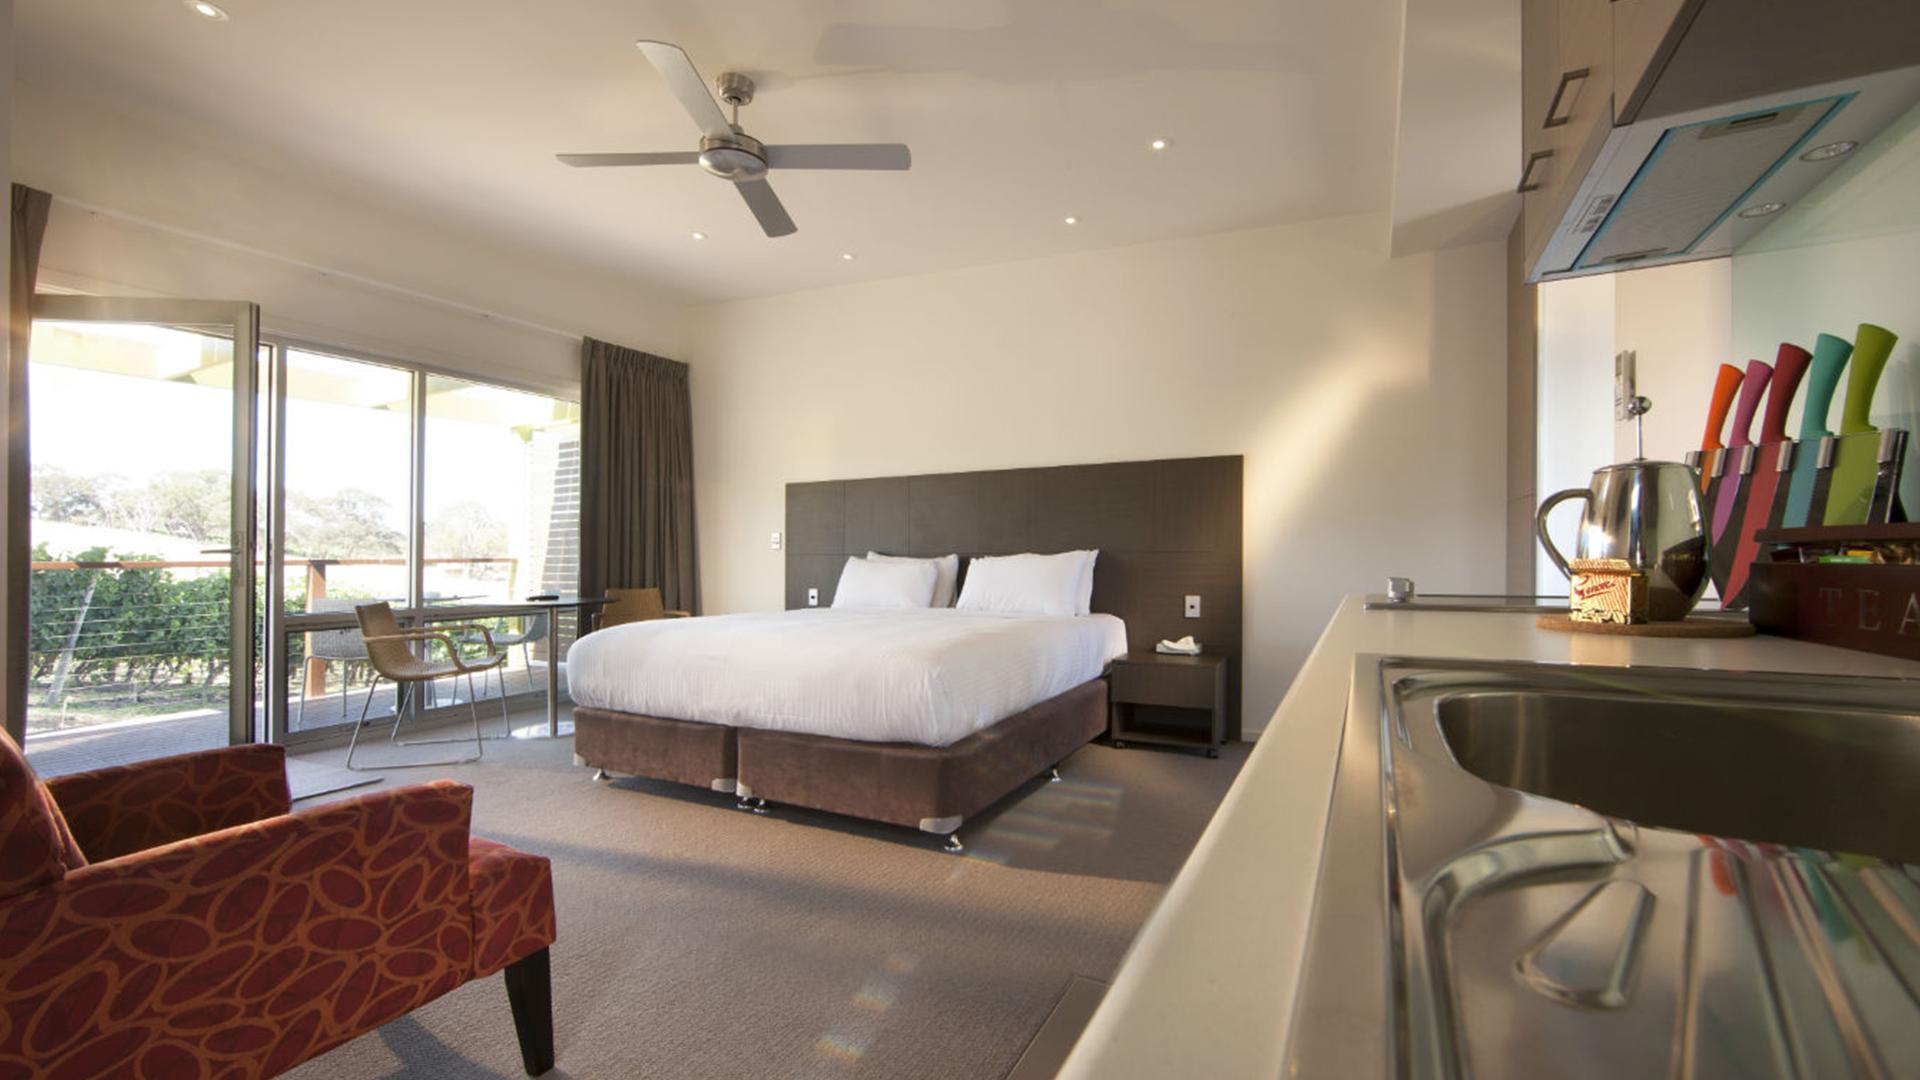 Vineyard Suite image 1 at Longview Vineyard by District Council of Mount Barker, South Australia, Australia